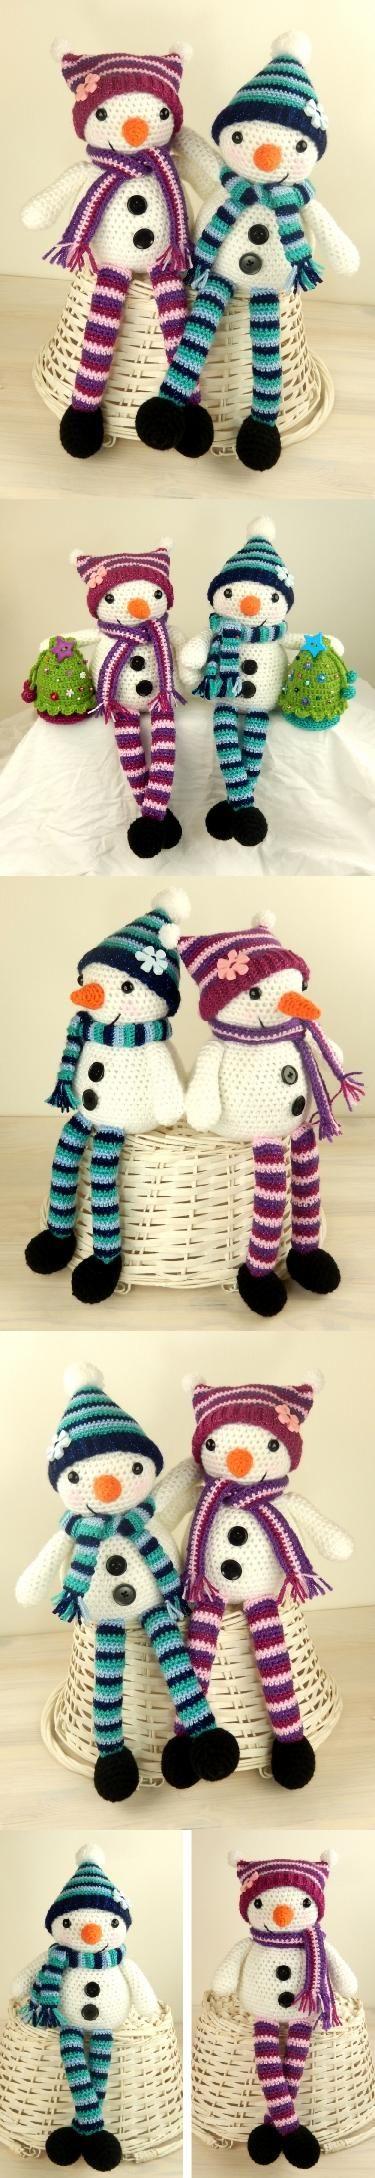 Mr and Mrs Snow amigurumi pattern by Janine Holmes at Moji-Moji Design